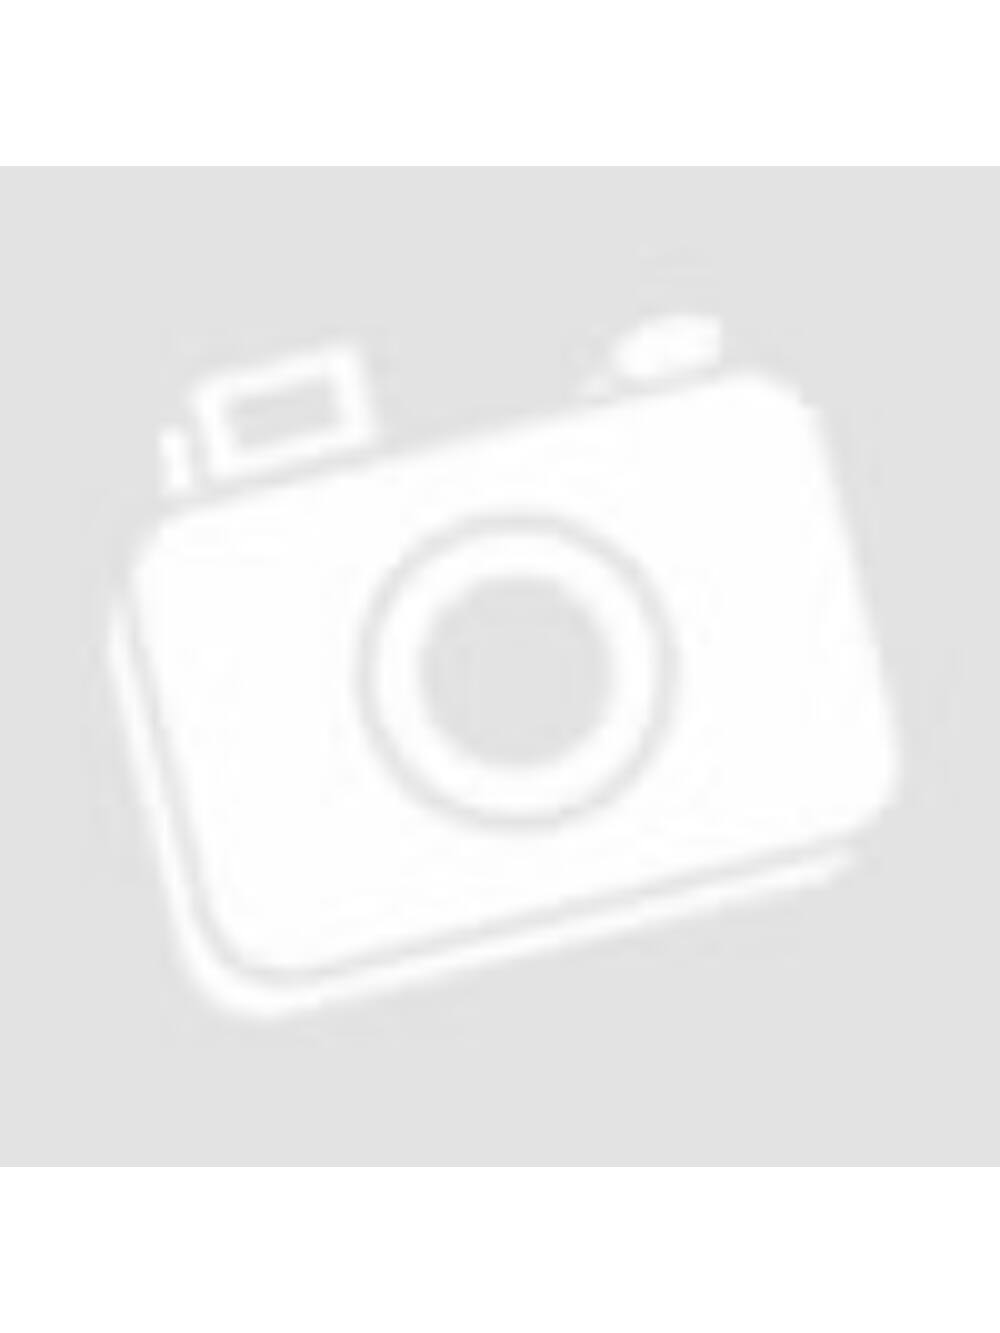 Csillámos gömb 4 cm - Világos lila